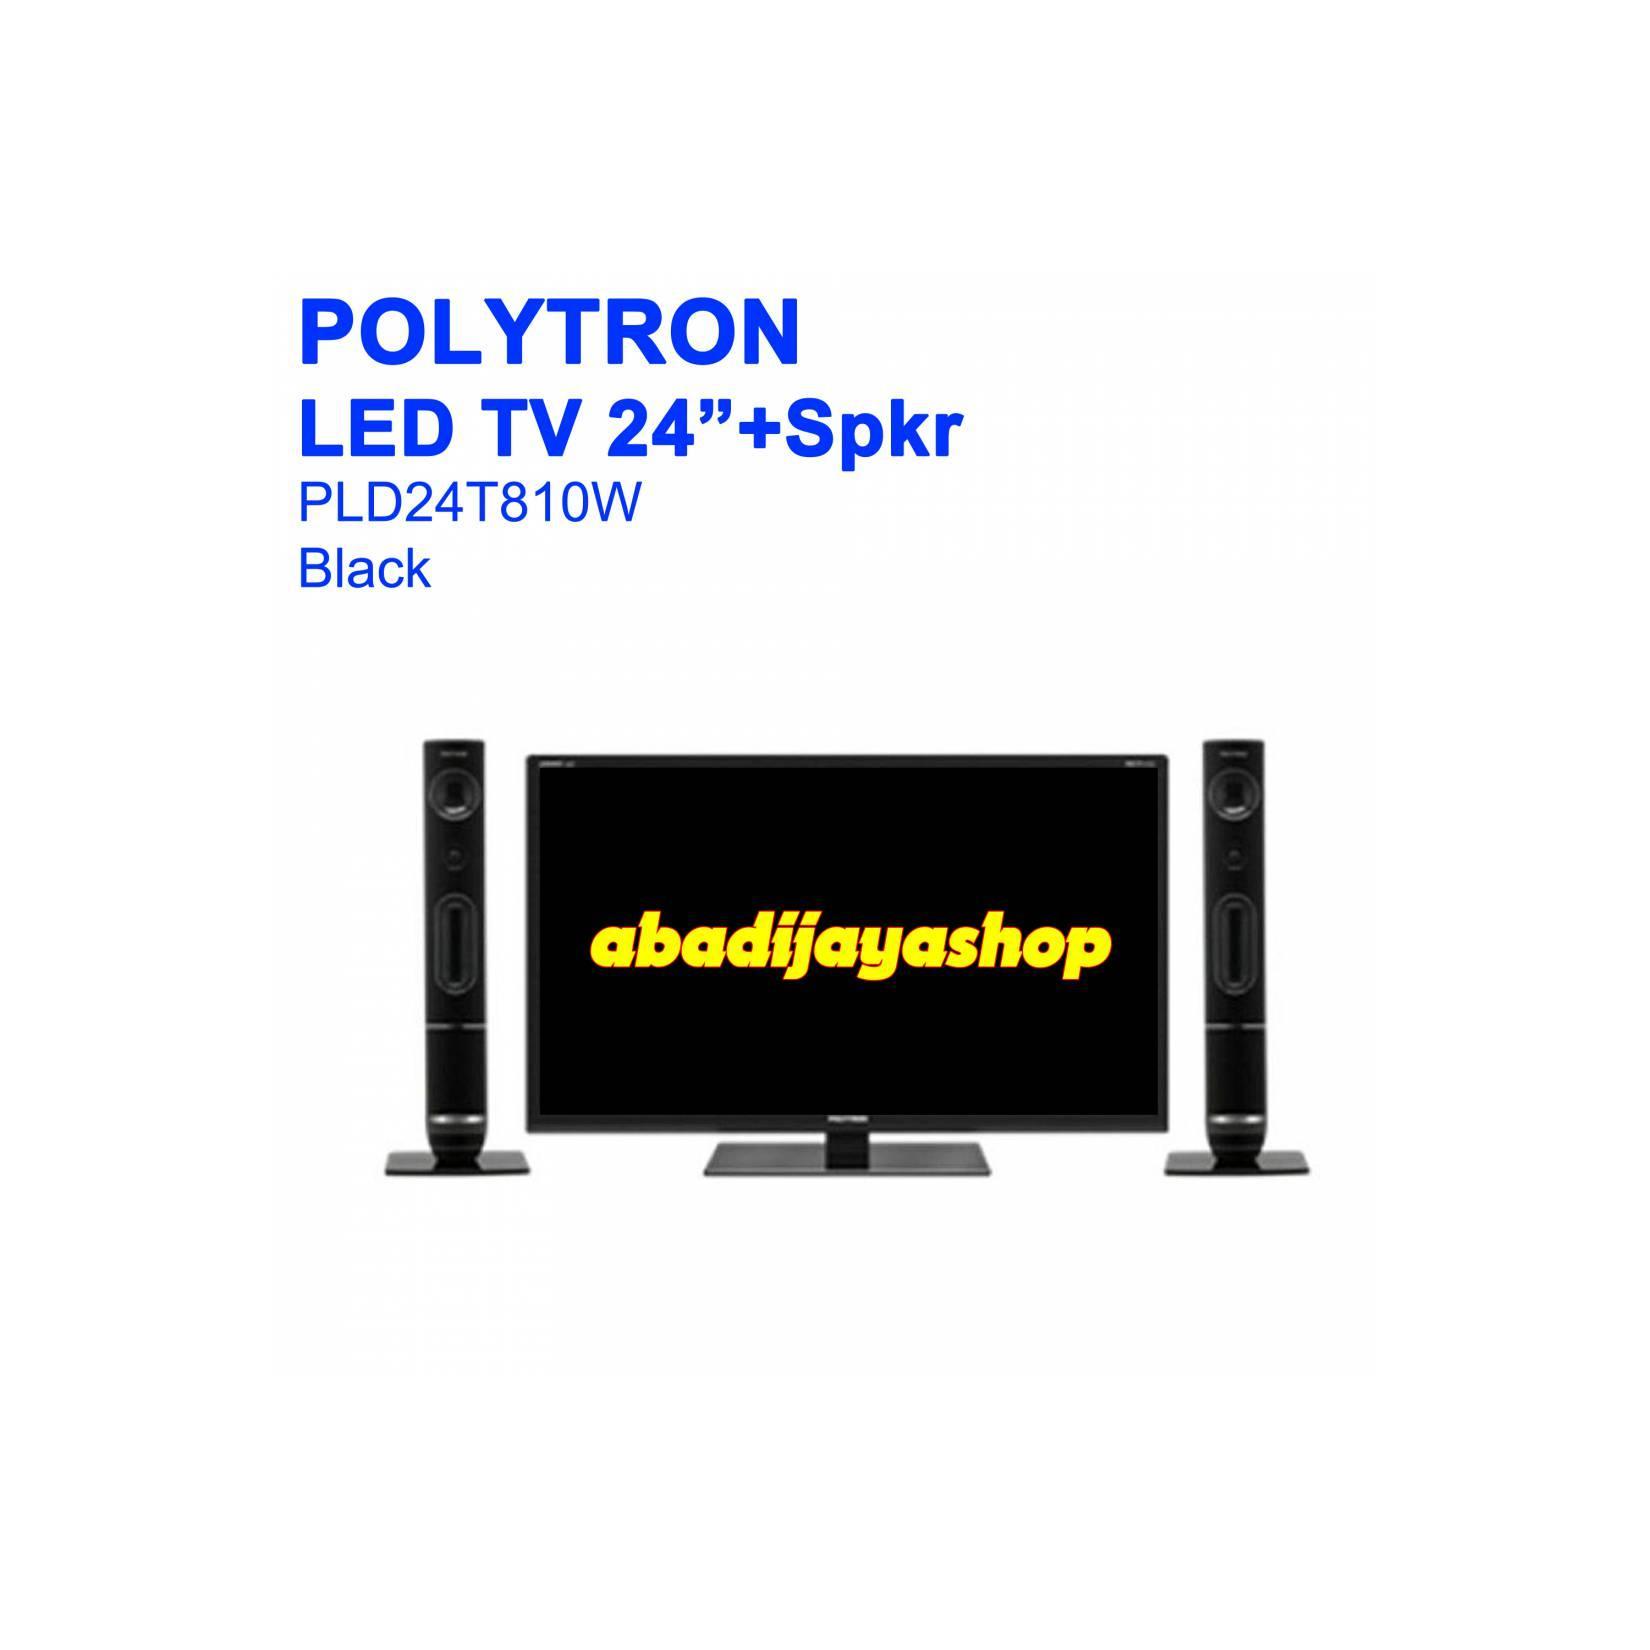 LED TV Polytron PLD24T810W PLD 24T810 WHITE